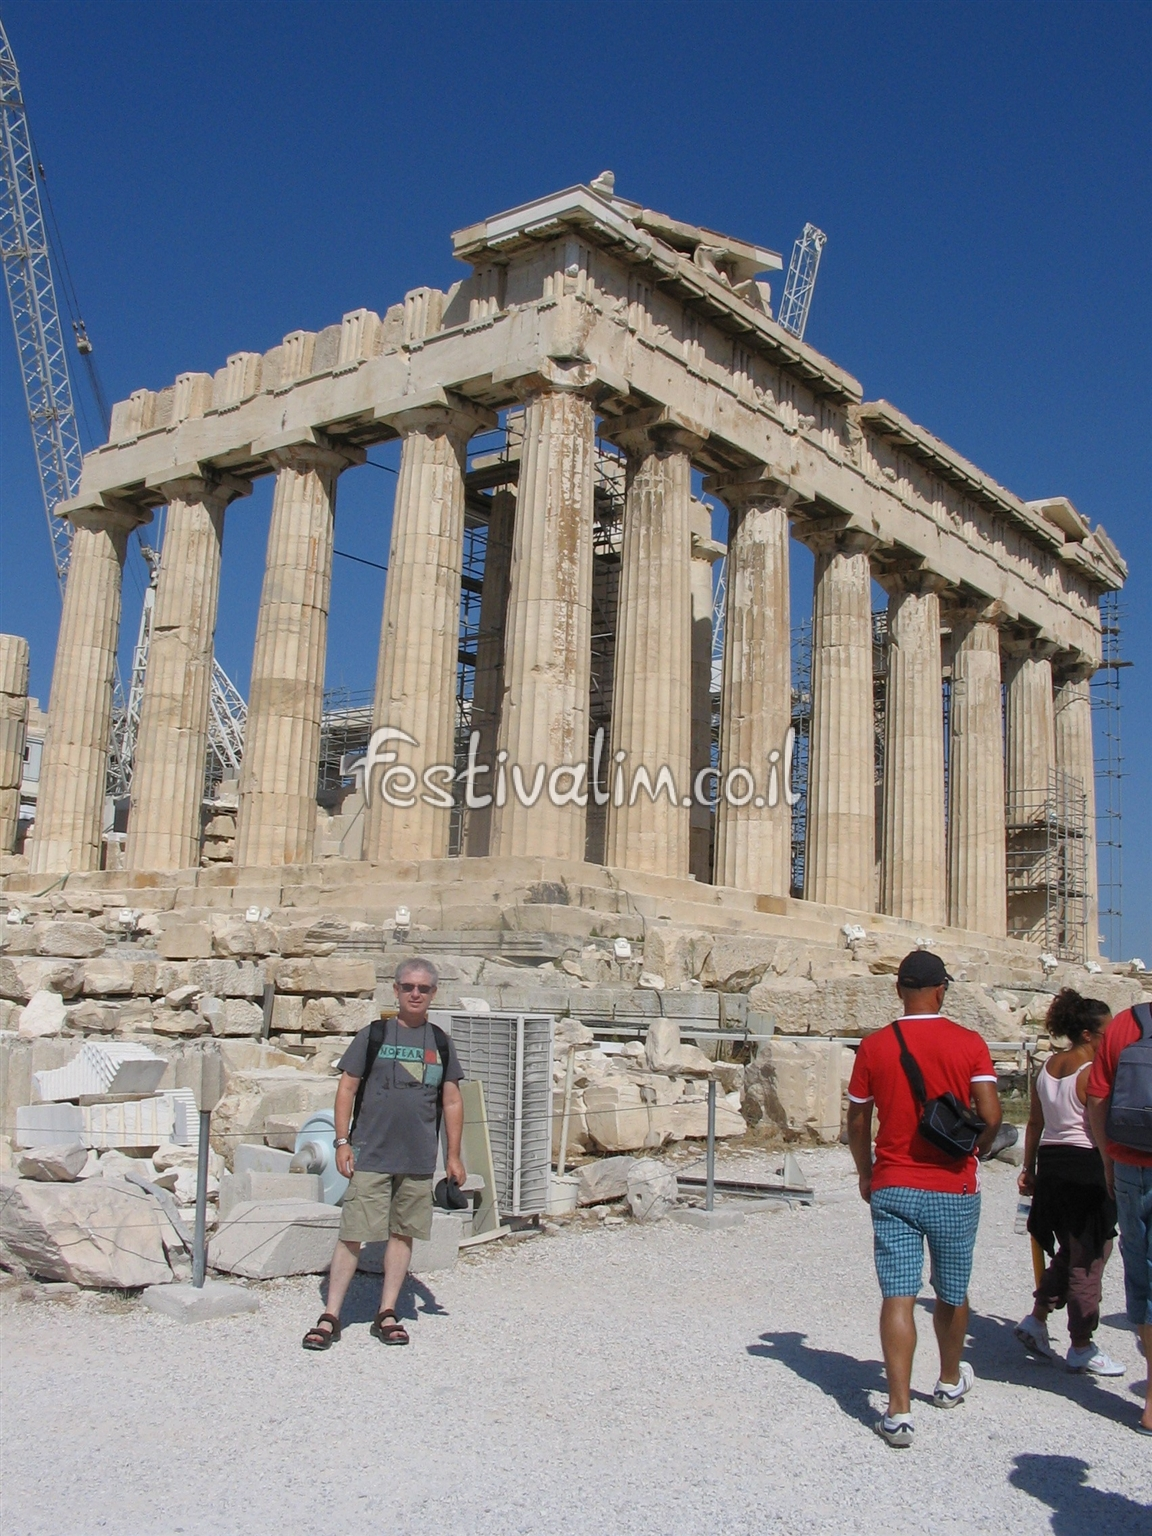 יוון, אתונה, אקרופוליס - צילום באדיבות: © CarniFest Online